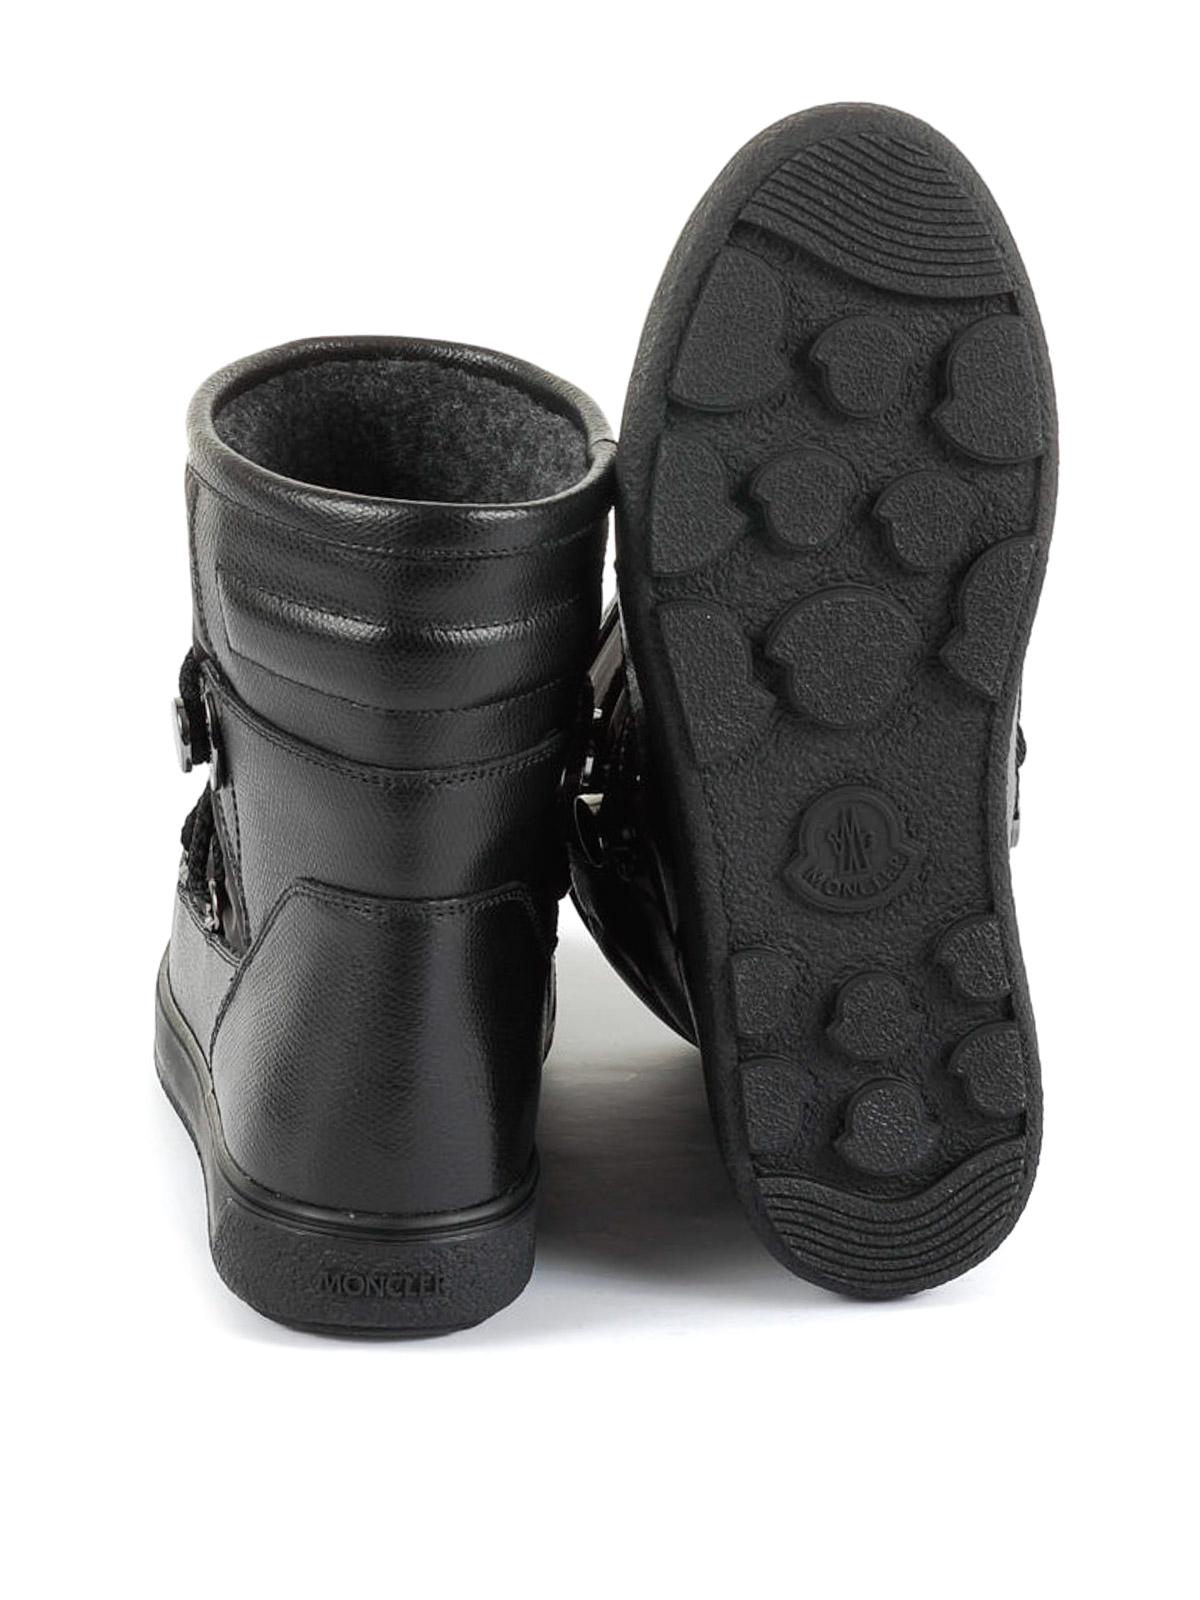 classic styles most popular exclusive deals Moncler - New Fanny black après-ski boots - snow boots ...